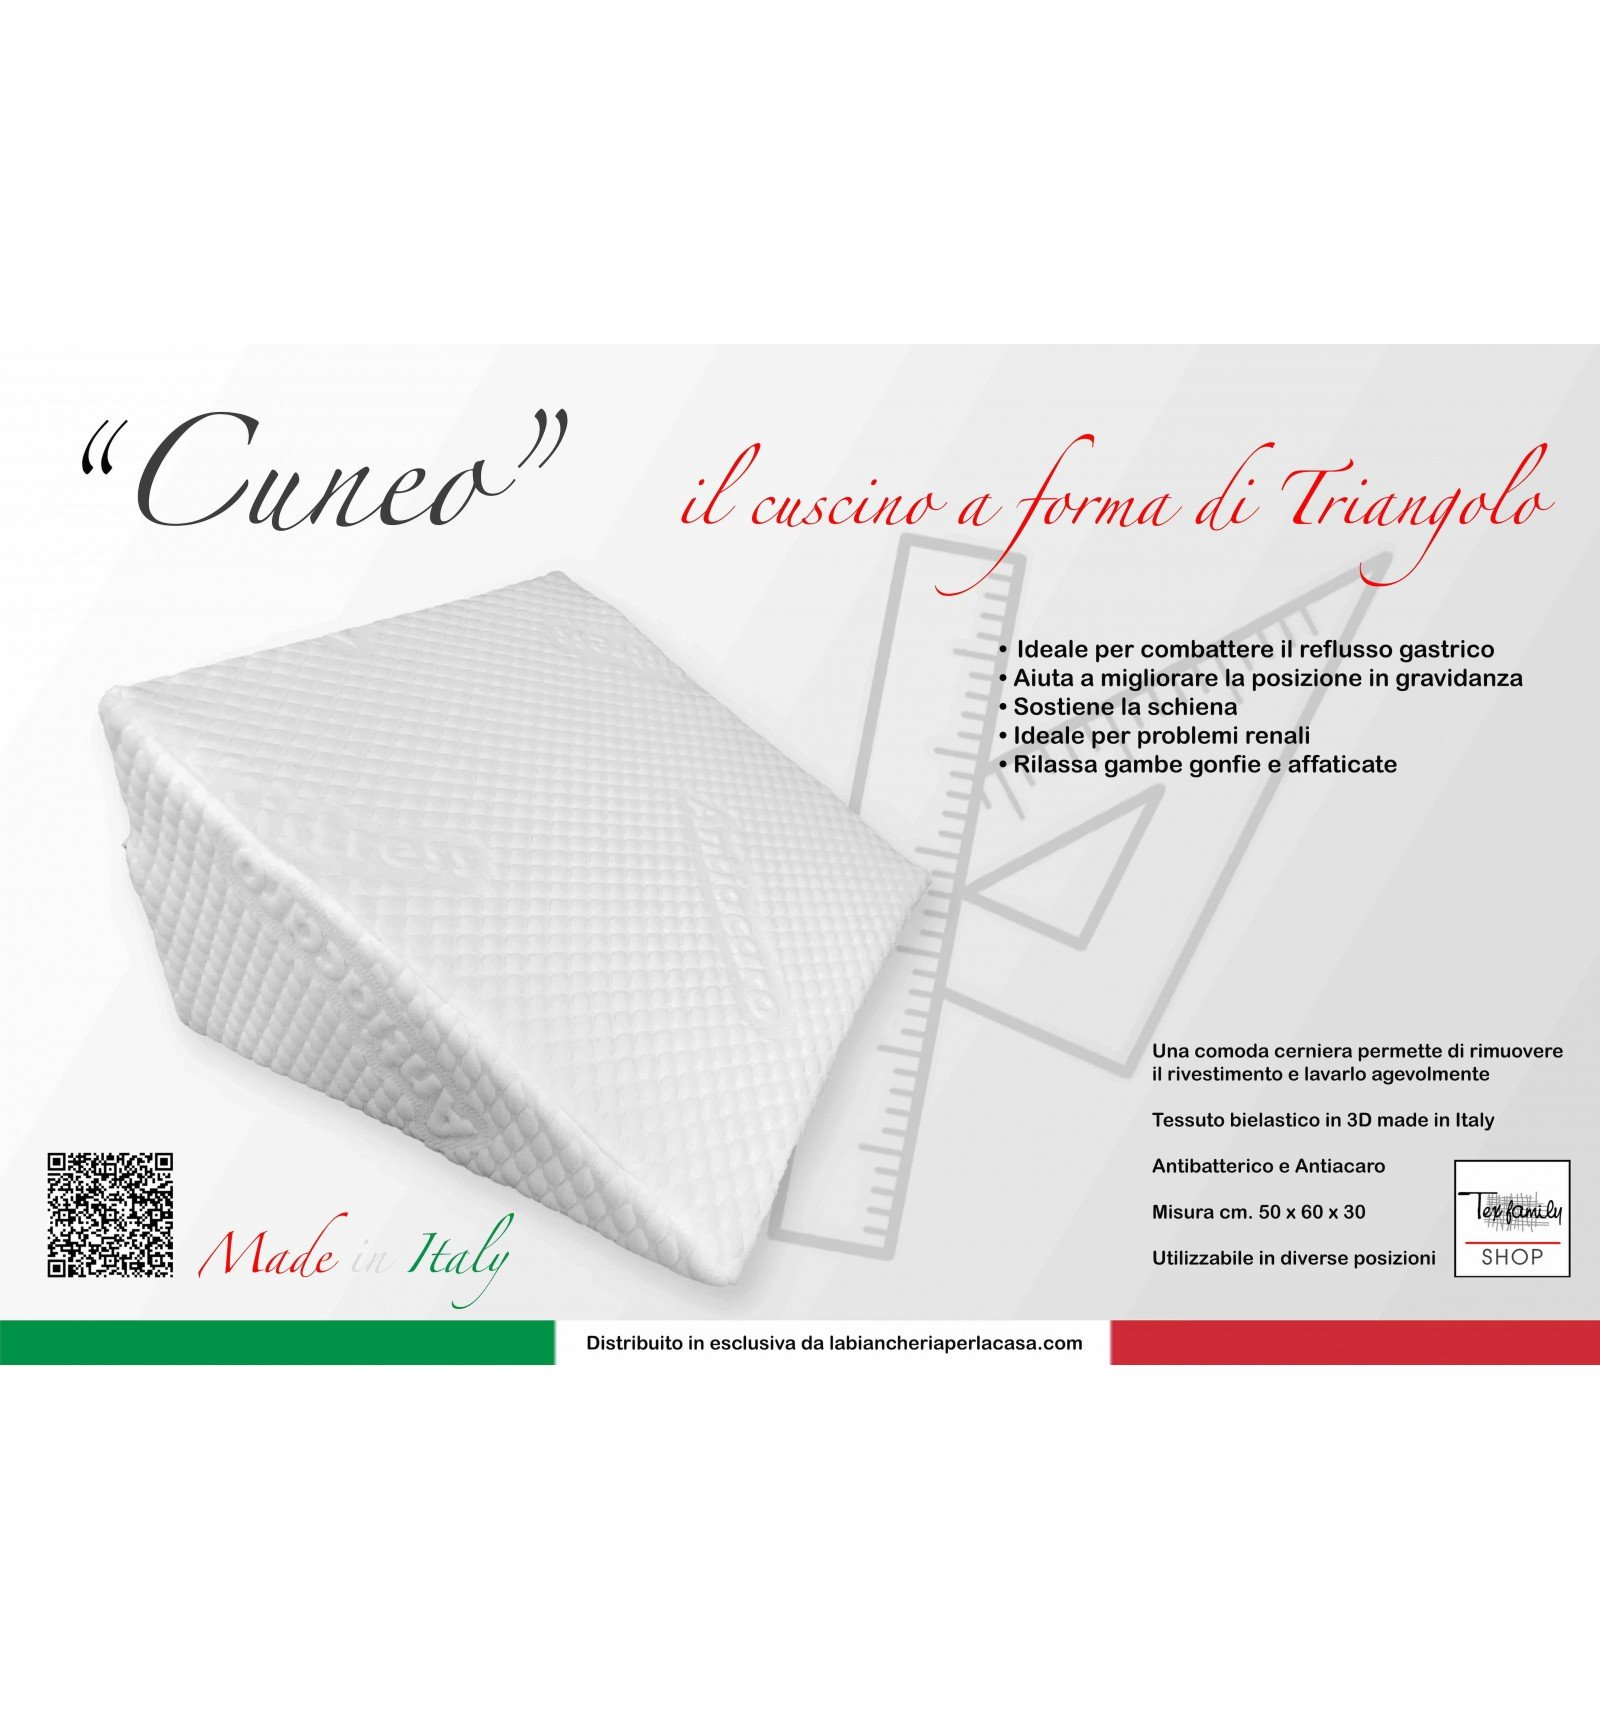 tex family Cuscino AD Angolo Triangolo A Cuneo Gambe Gravidanza ...